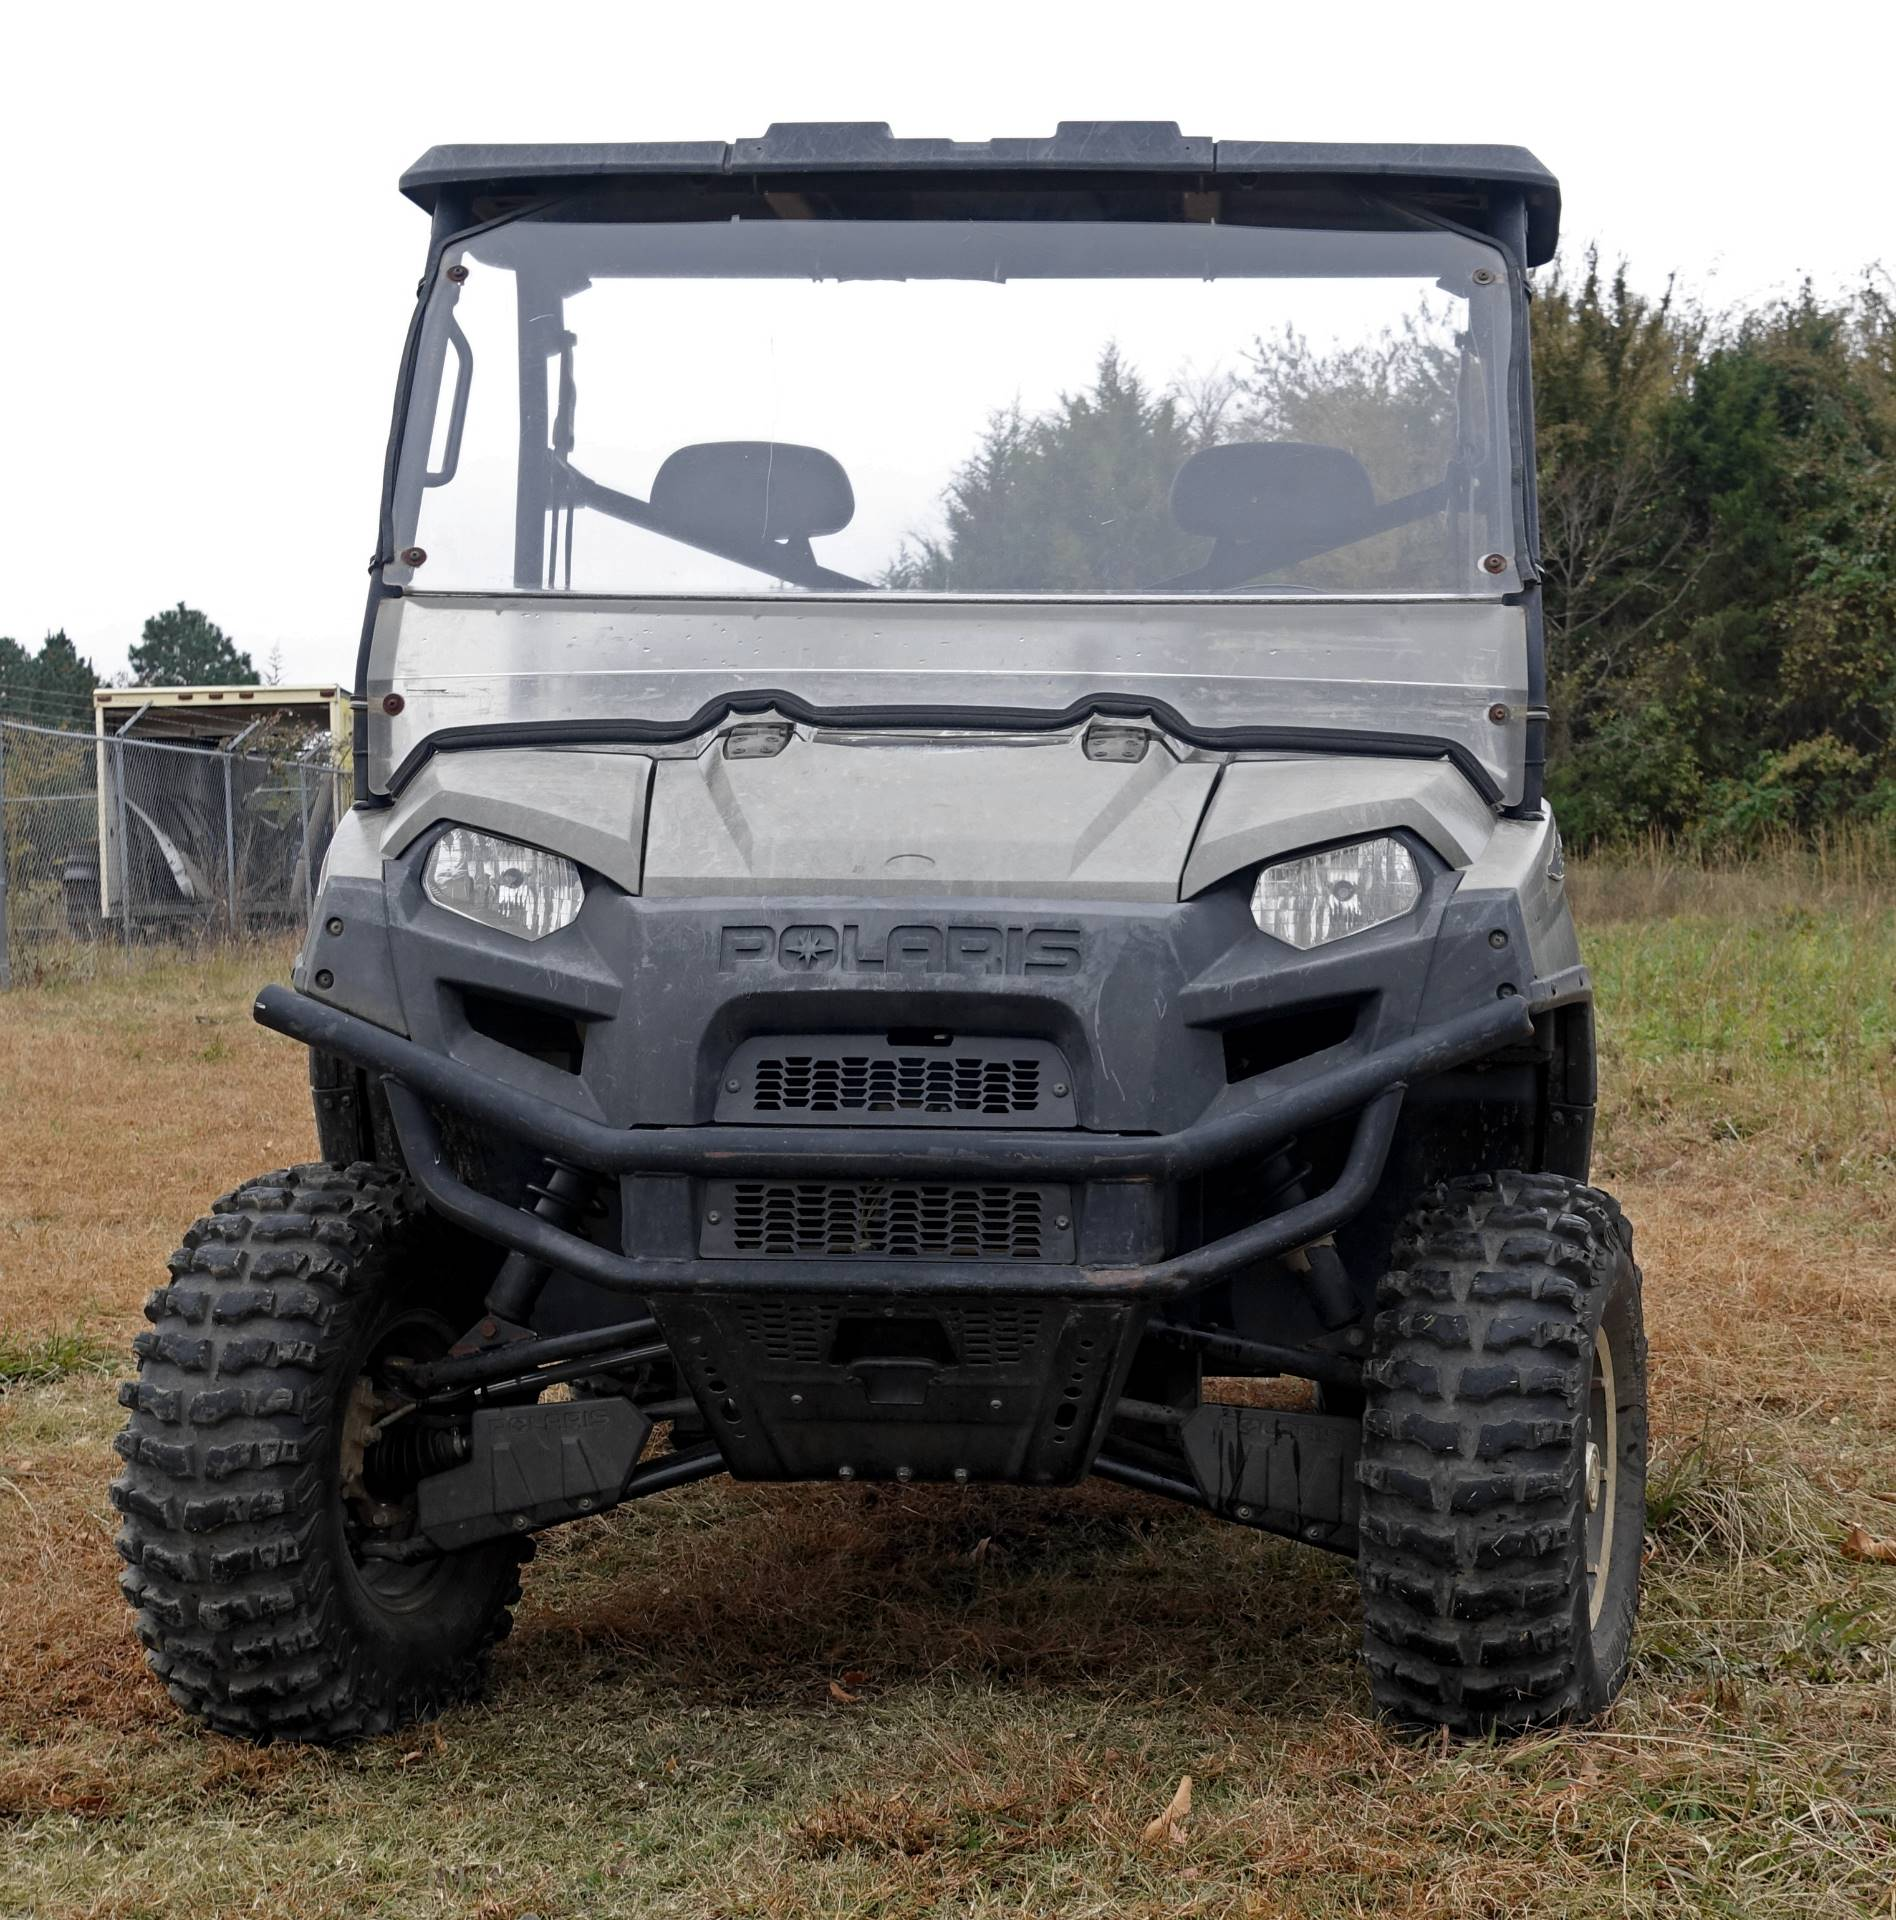 2010 Ranger HD 800 EFI